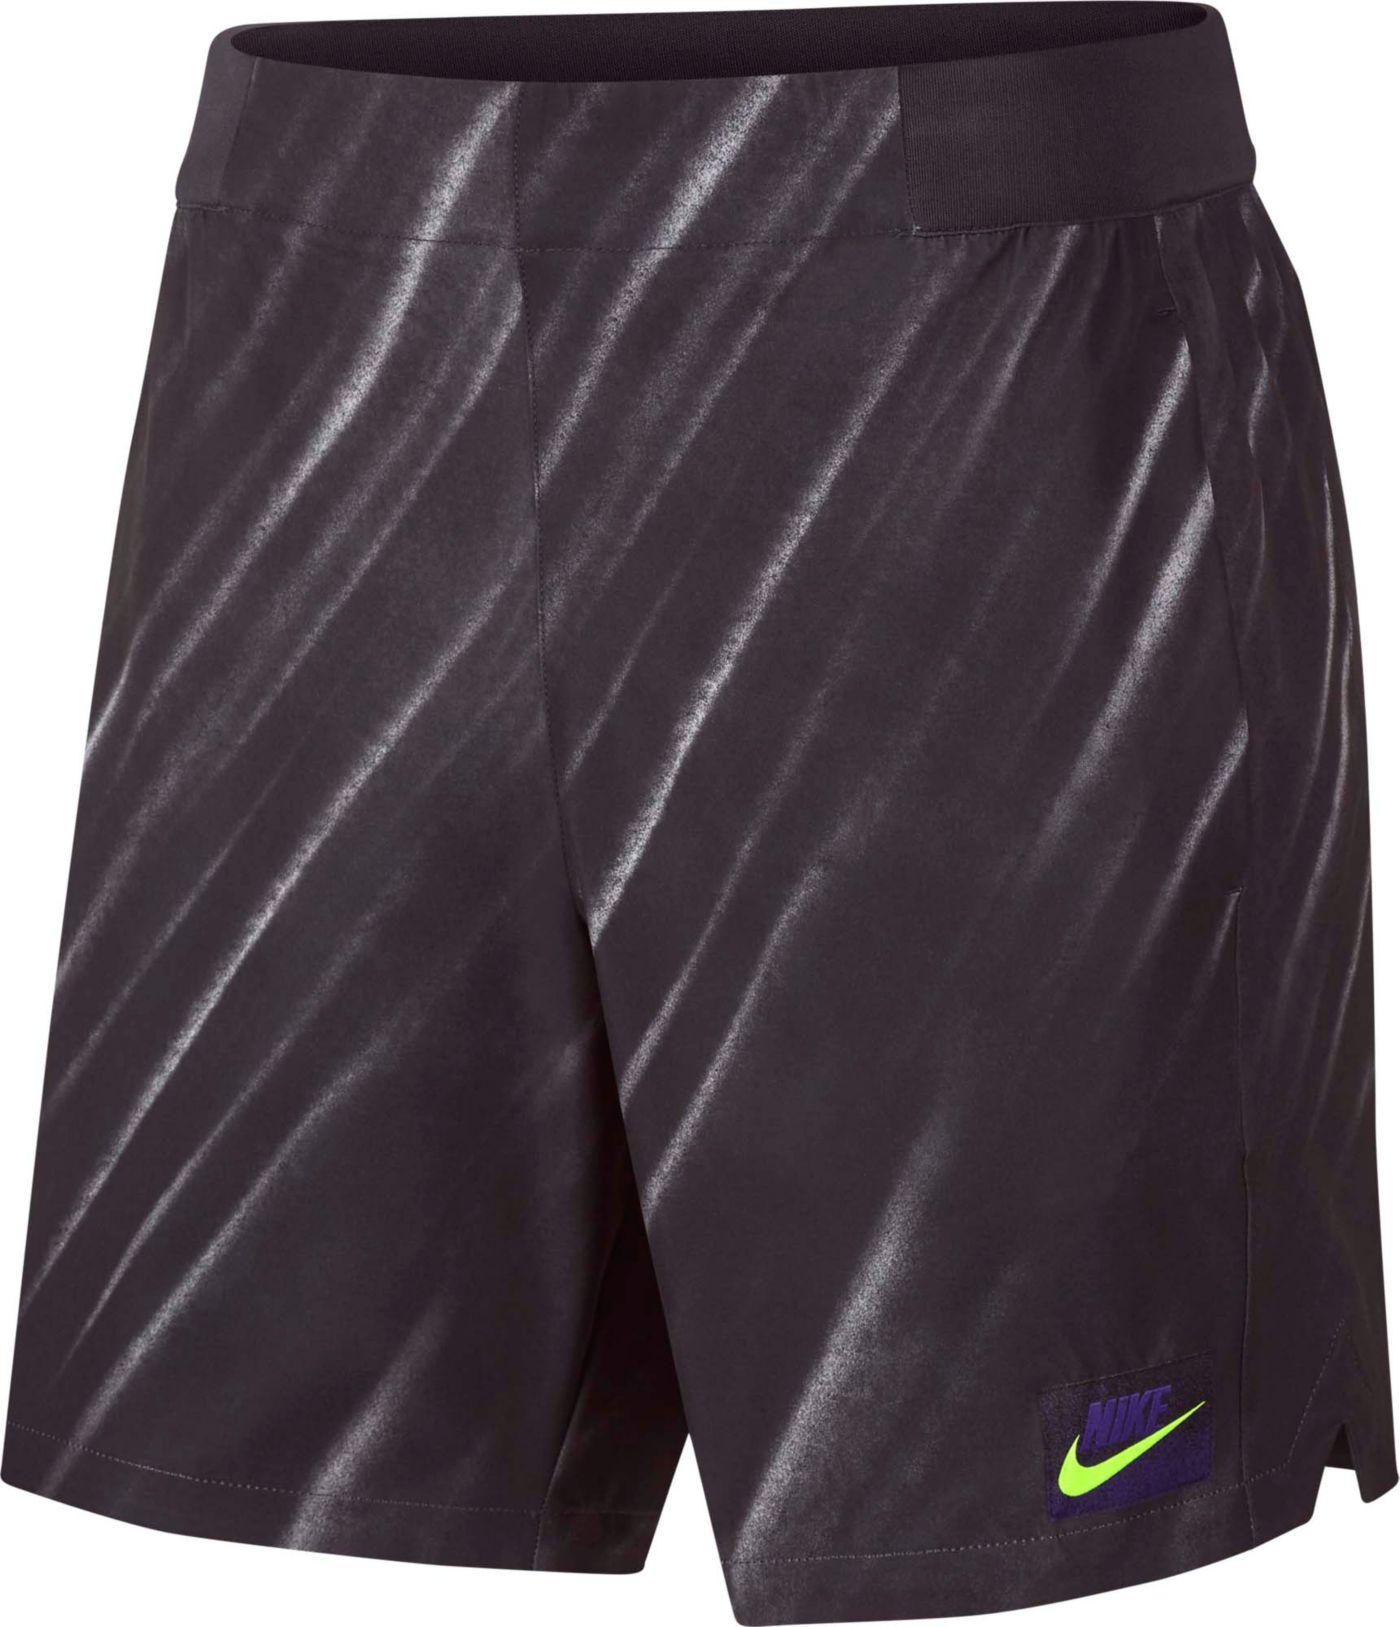 Nike Men's NikeCourt Flex Ace Tennis Shorts